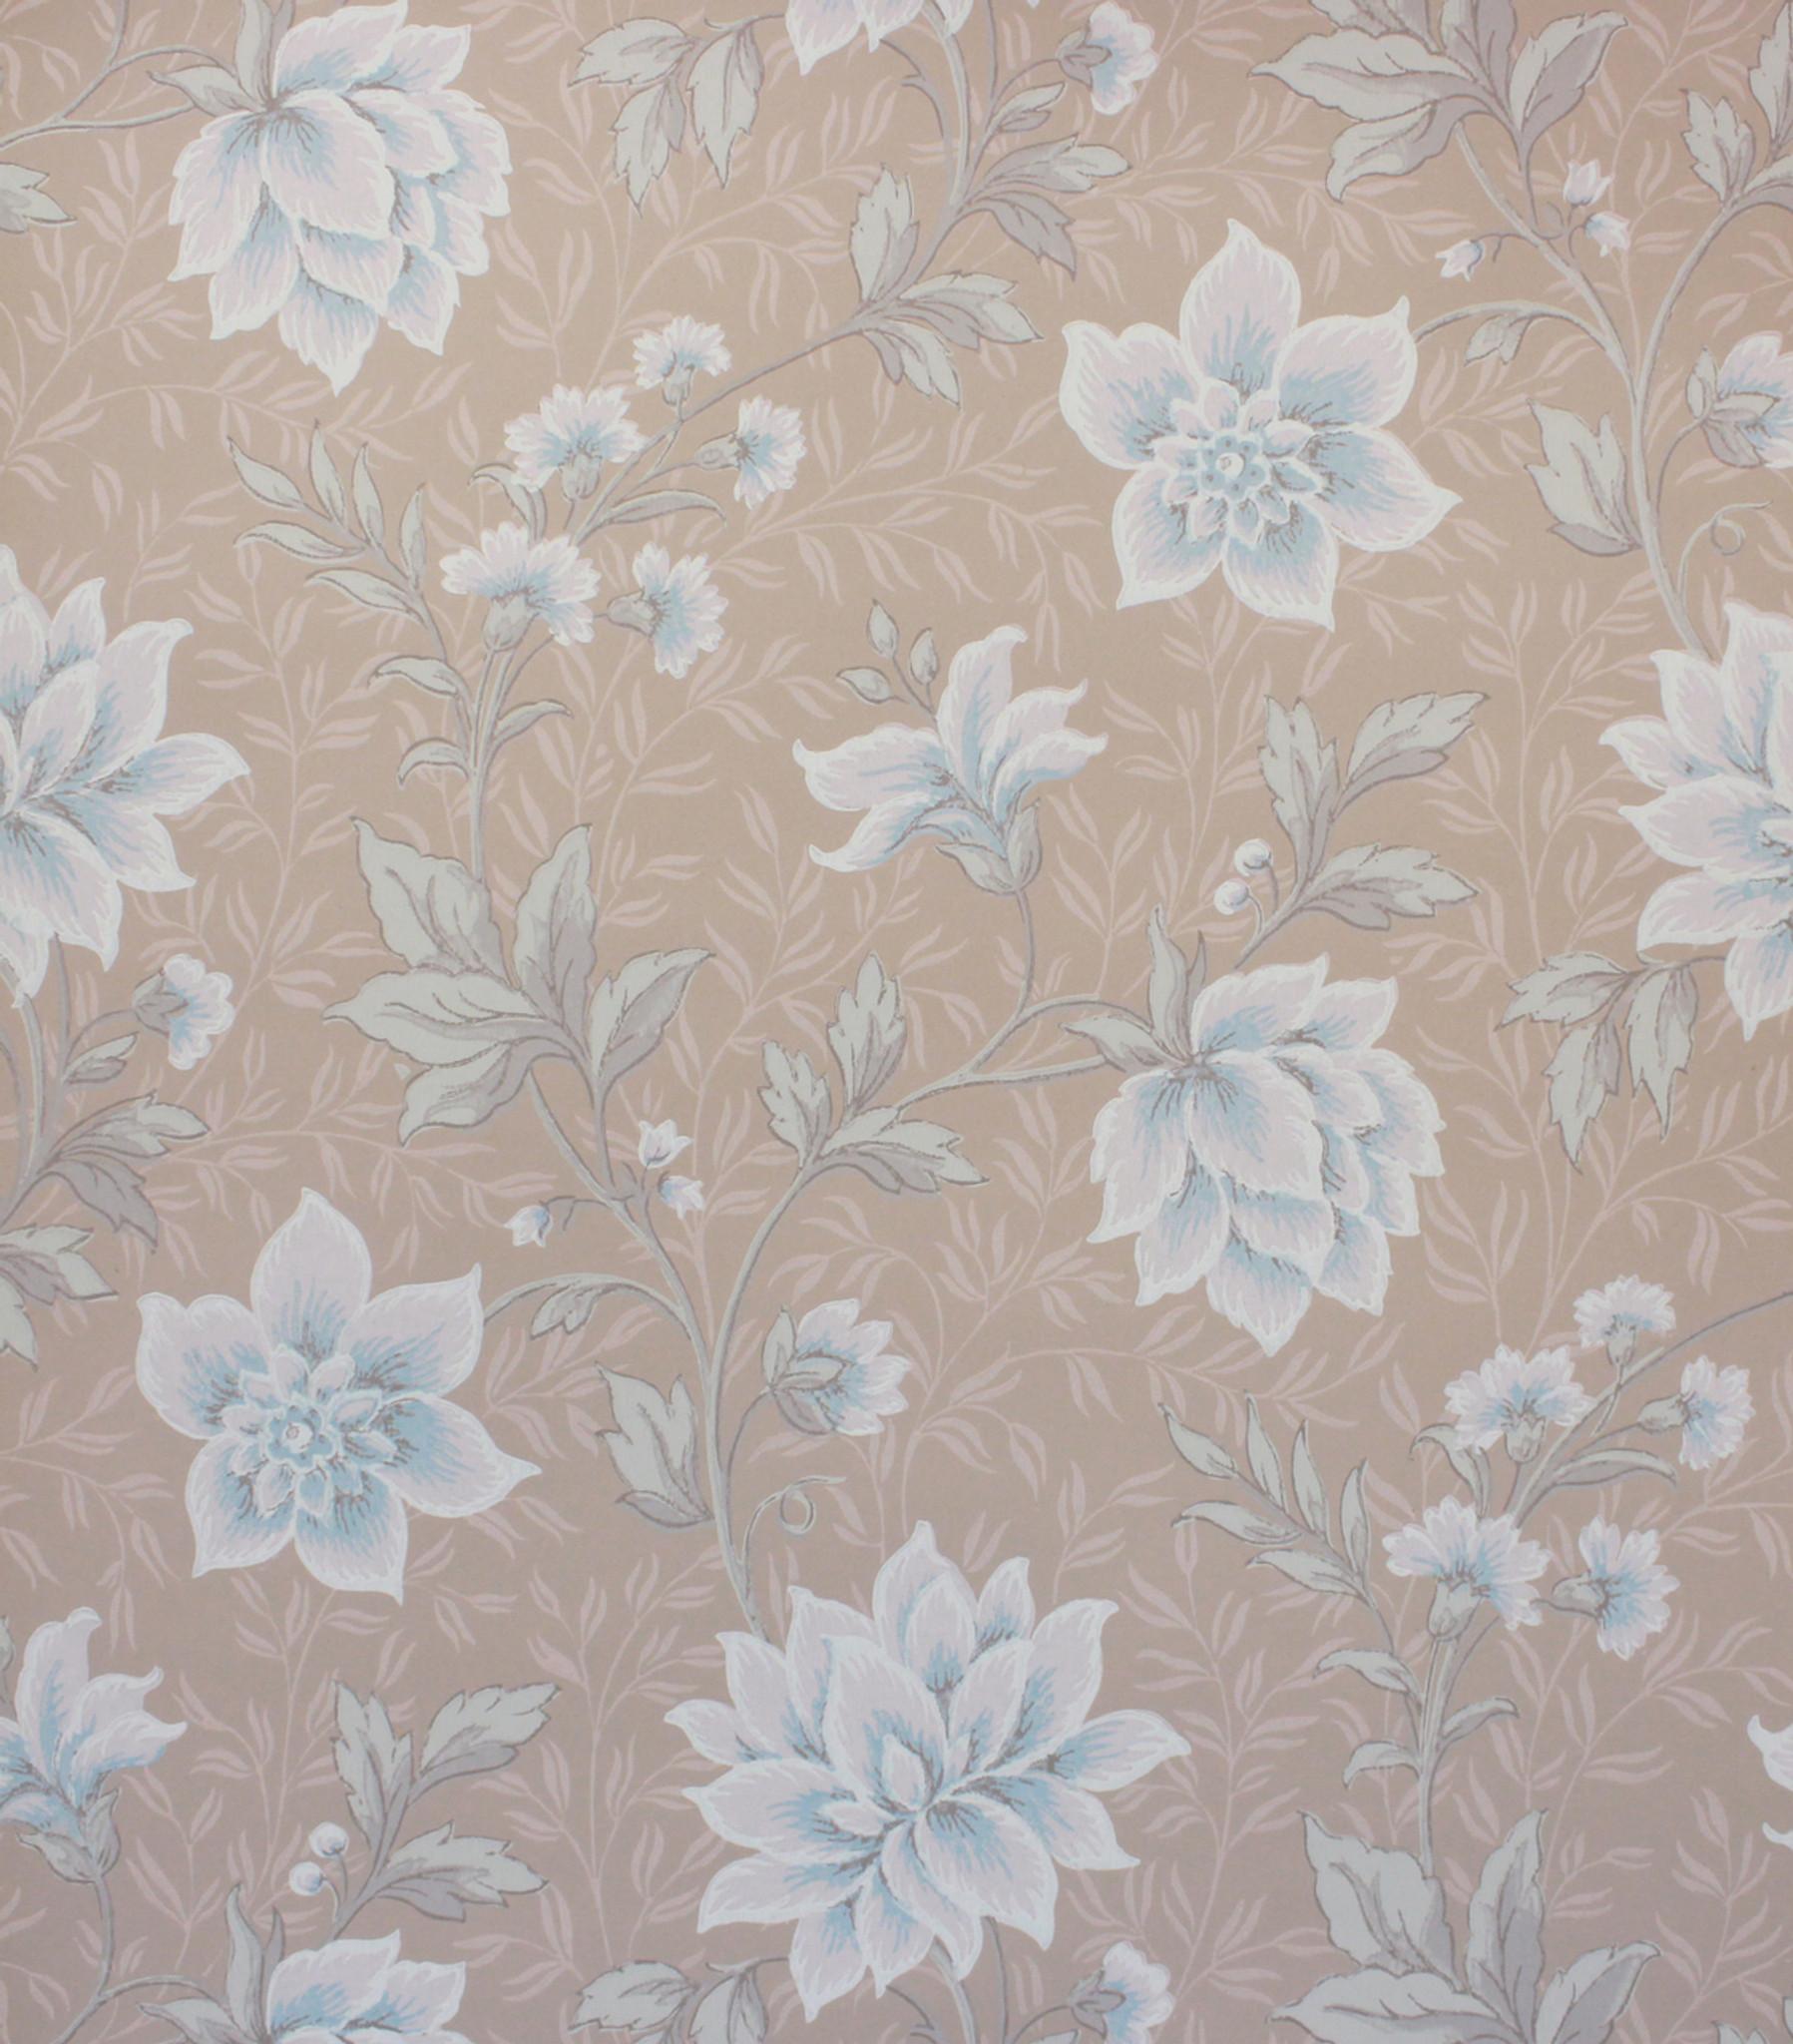 1940s Vintage Wallpaper Blue And Pink Flowers On Beige Rosies